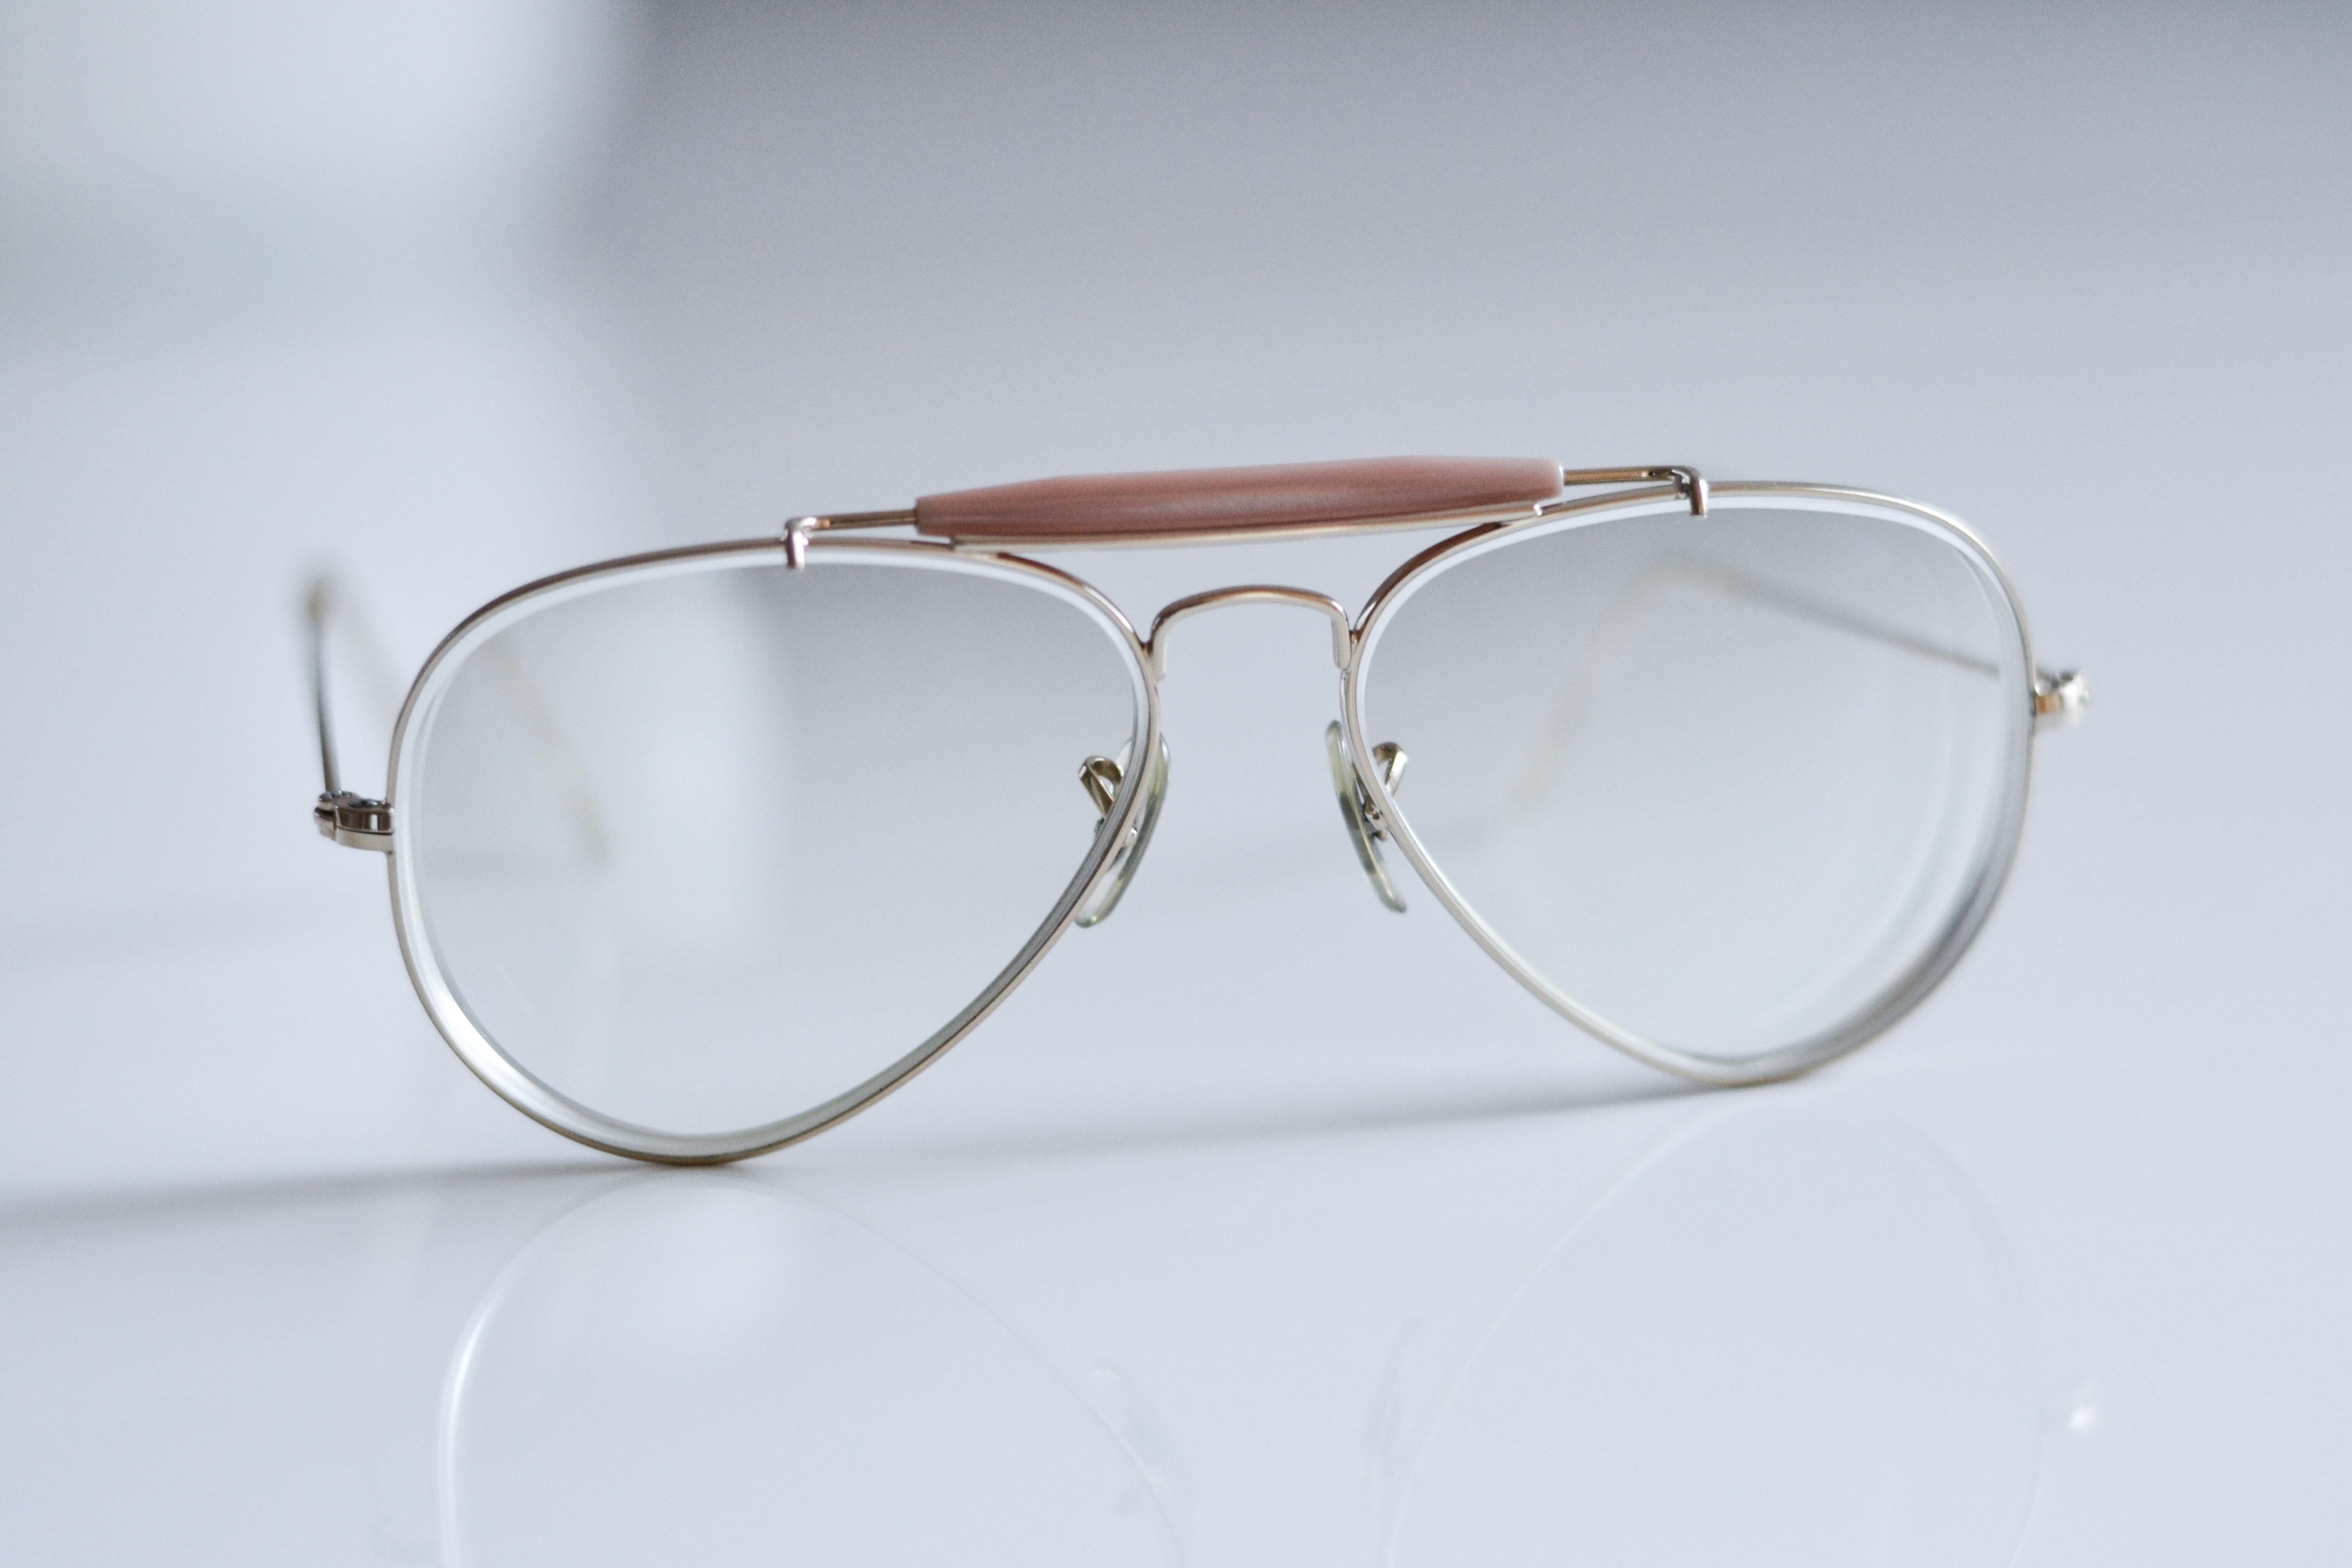 allthatchoices laura mainz fashionblog rayban ray ban aviator outdoorsman pilotenbrille sehstärke sonnenbrille als brille rosa rose gold.JPG